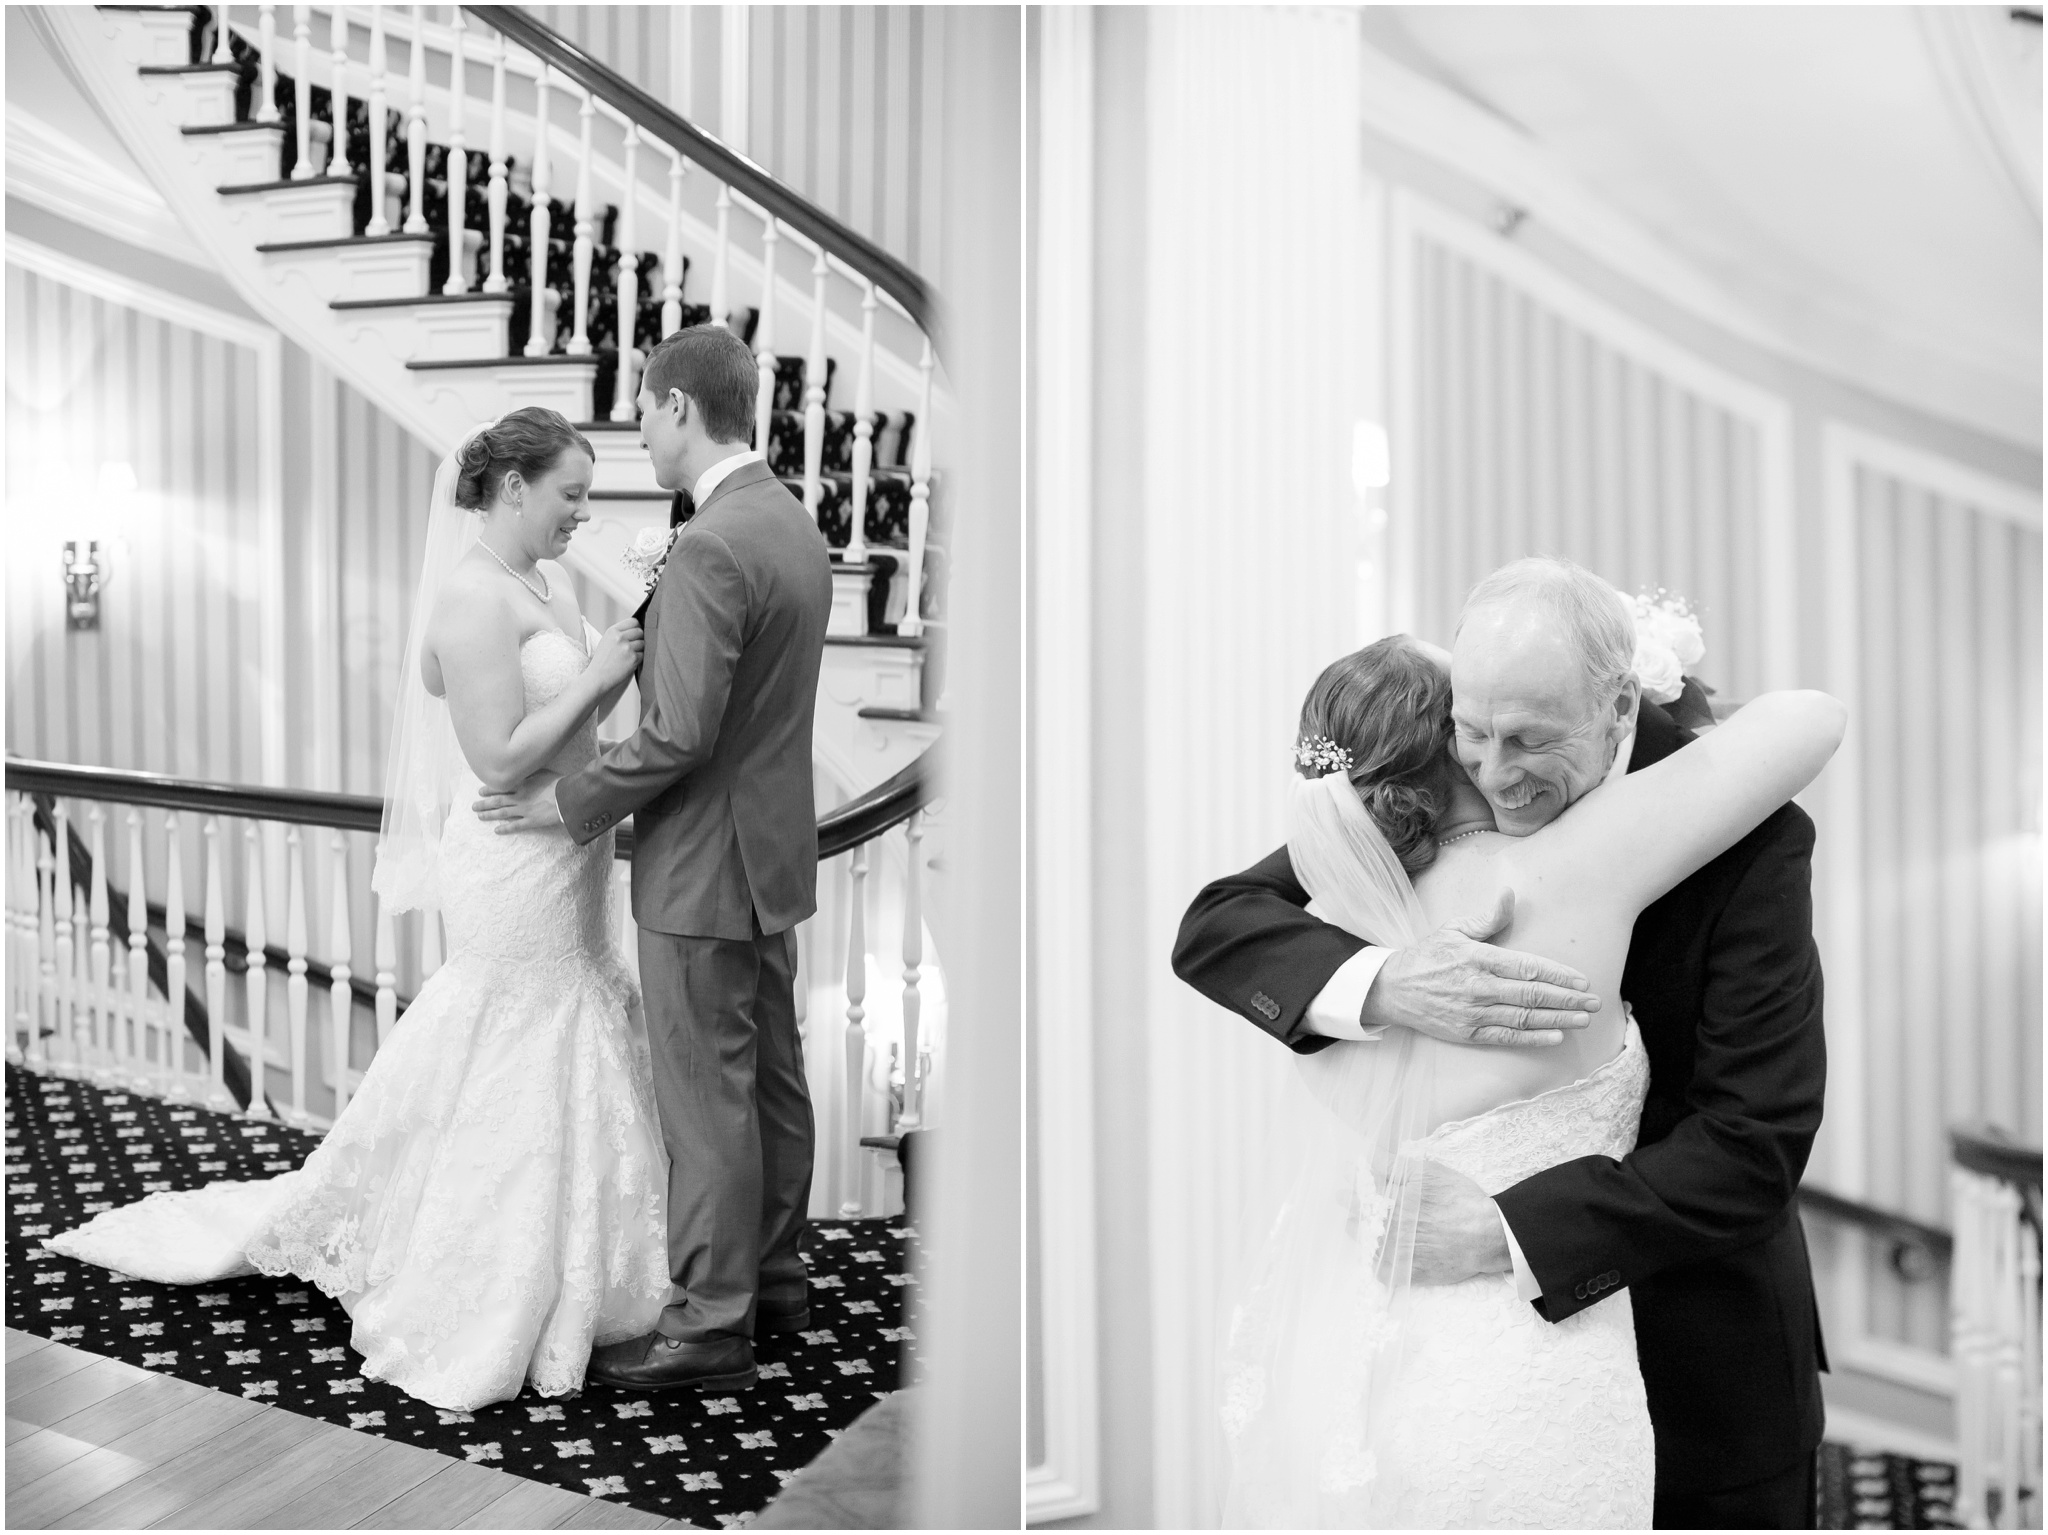 Madison_Club_Madison_Wisconsin_Wedding_Photographer_Spring_Rainy_Wedding_2601.jpg